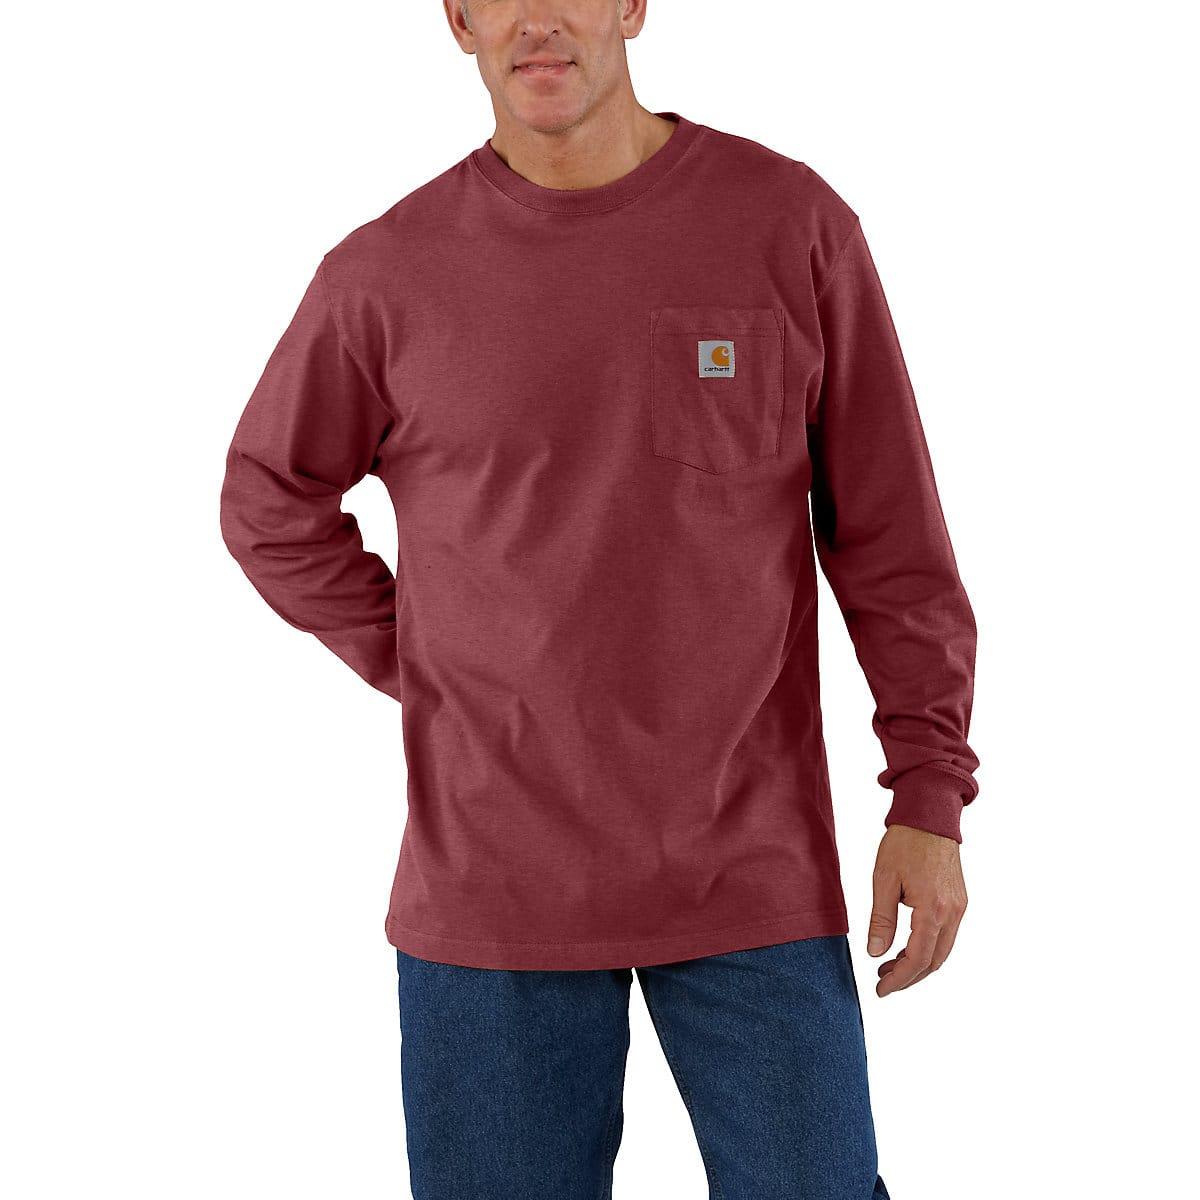 Mens Workwear Long Sleeve Pocket T Shirt K126 Carhartt